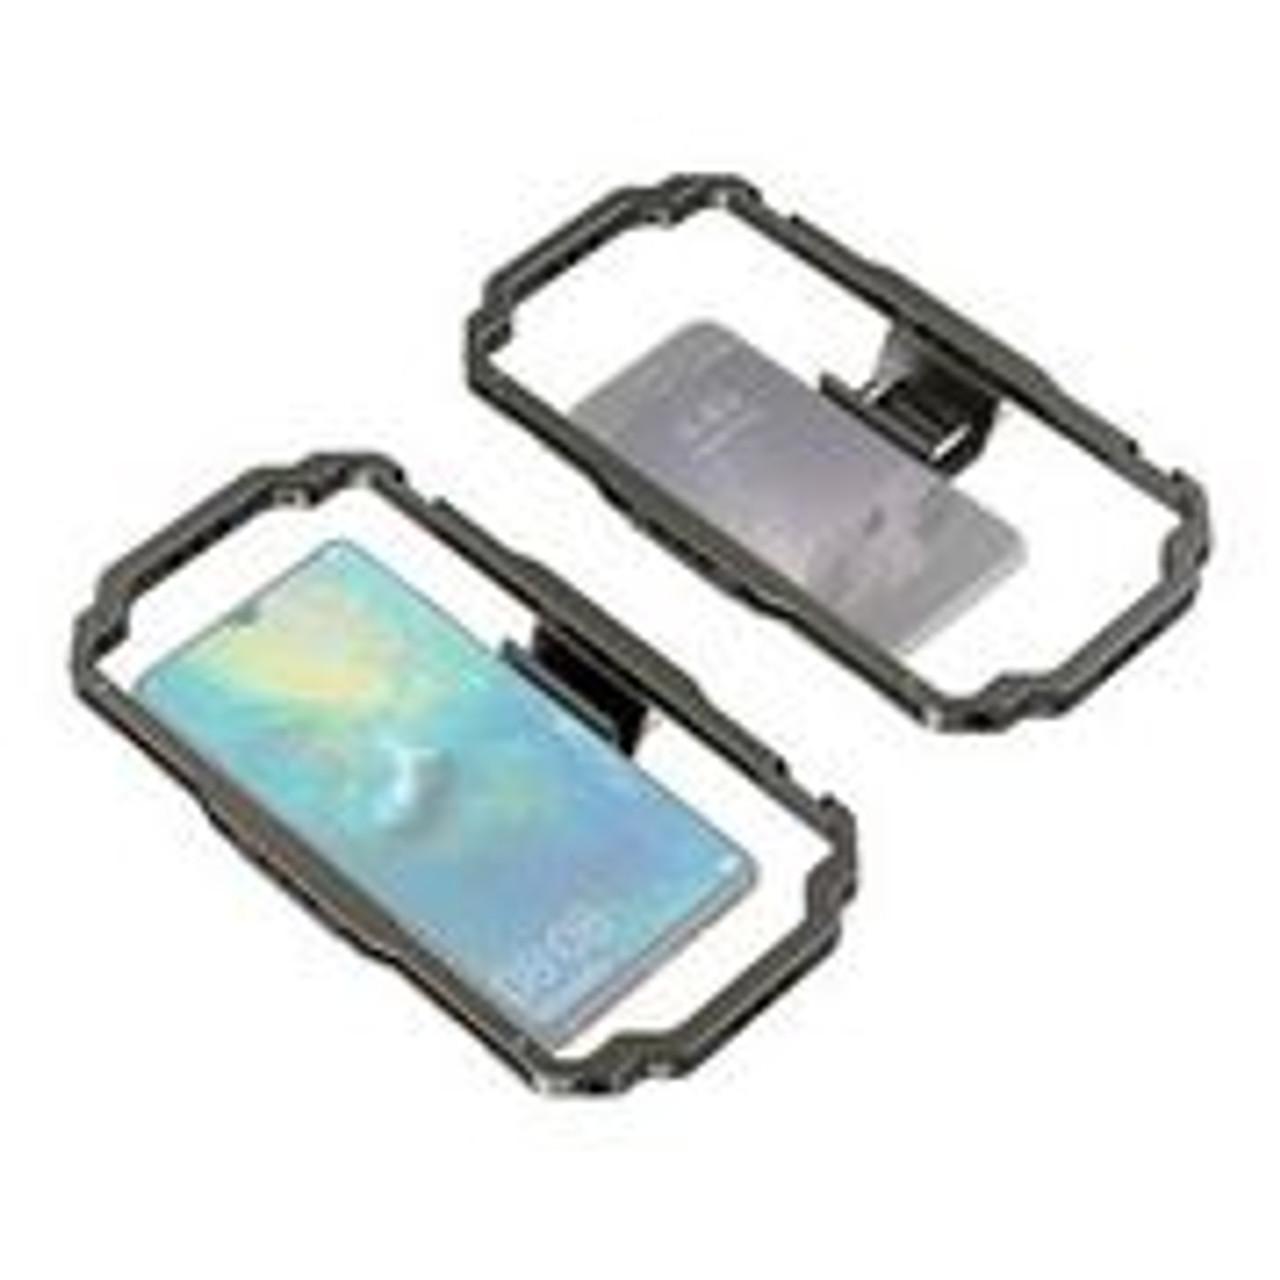 SMALLRIG UNIVERSAL PHONE CAGE